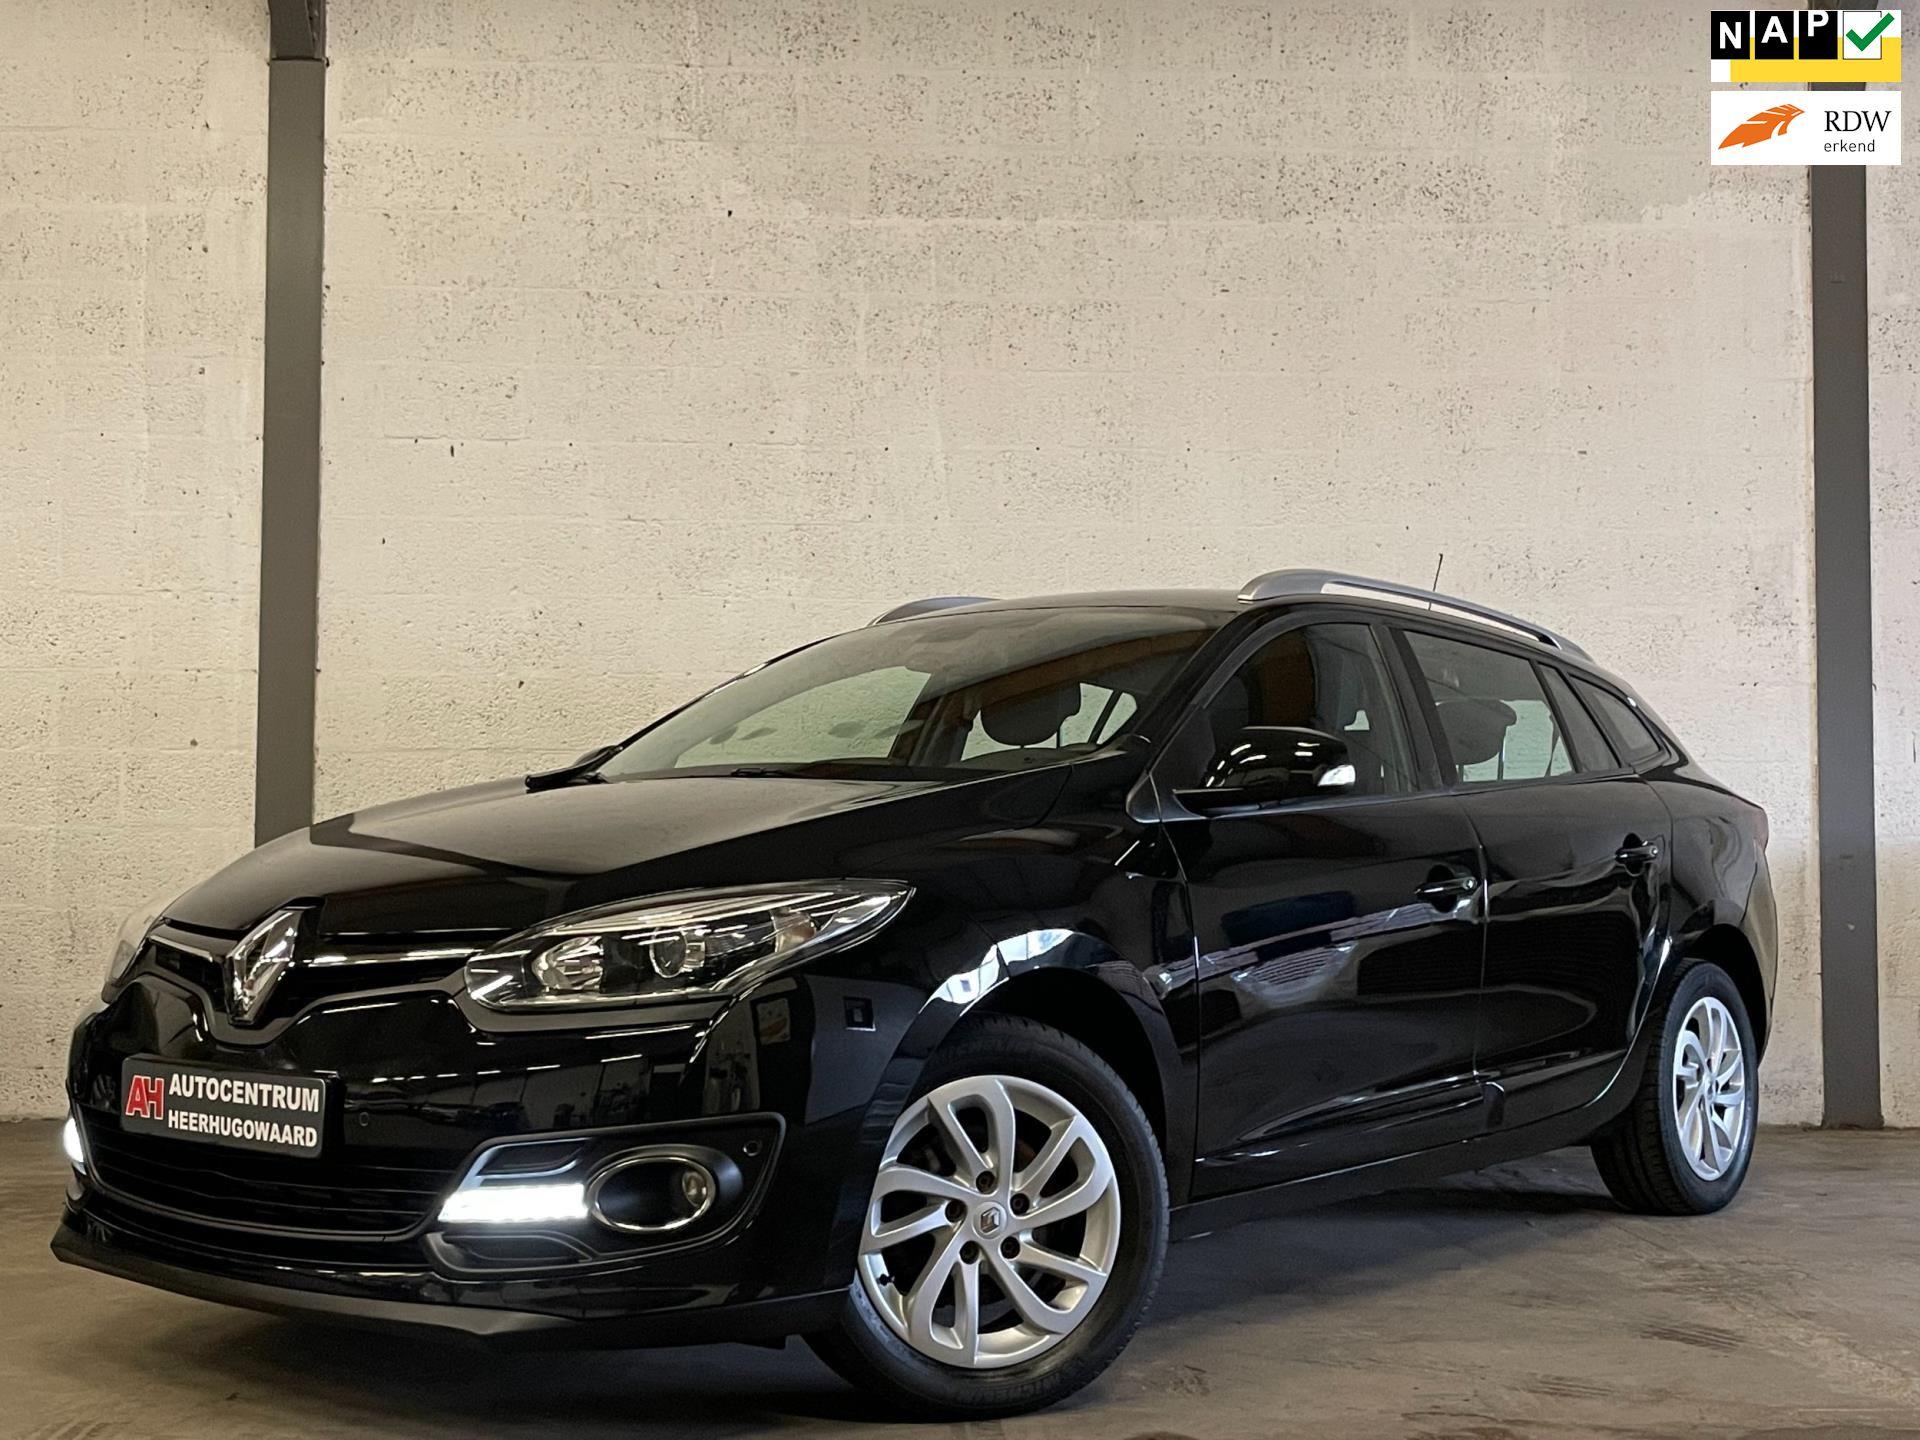 Renault Mégane Estate occasion - Auto Centrum Heerhugowaard